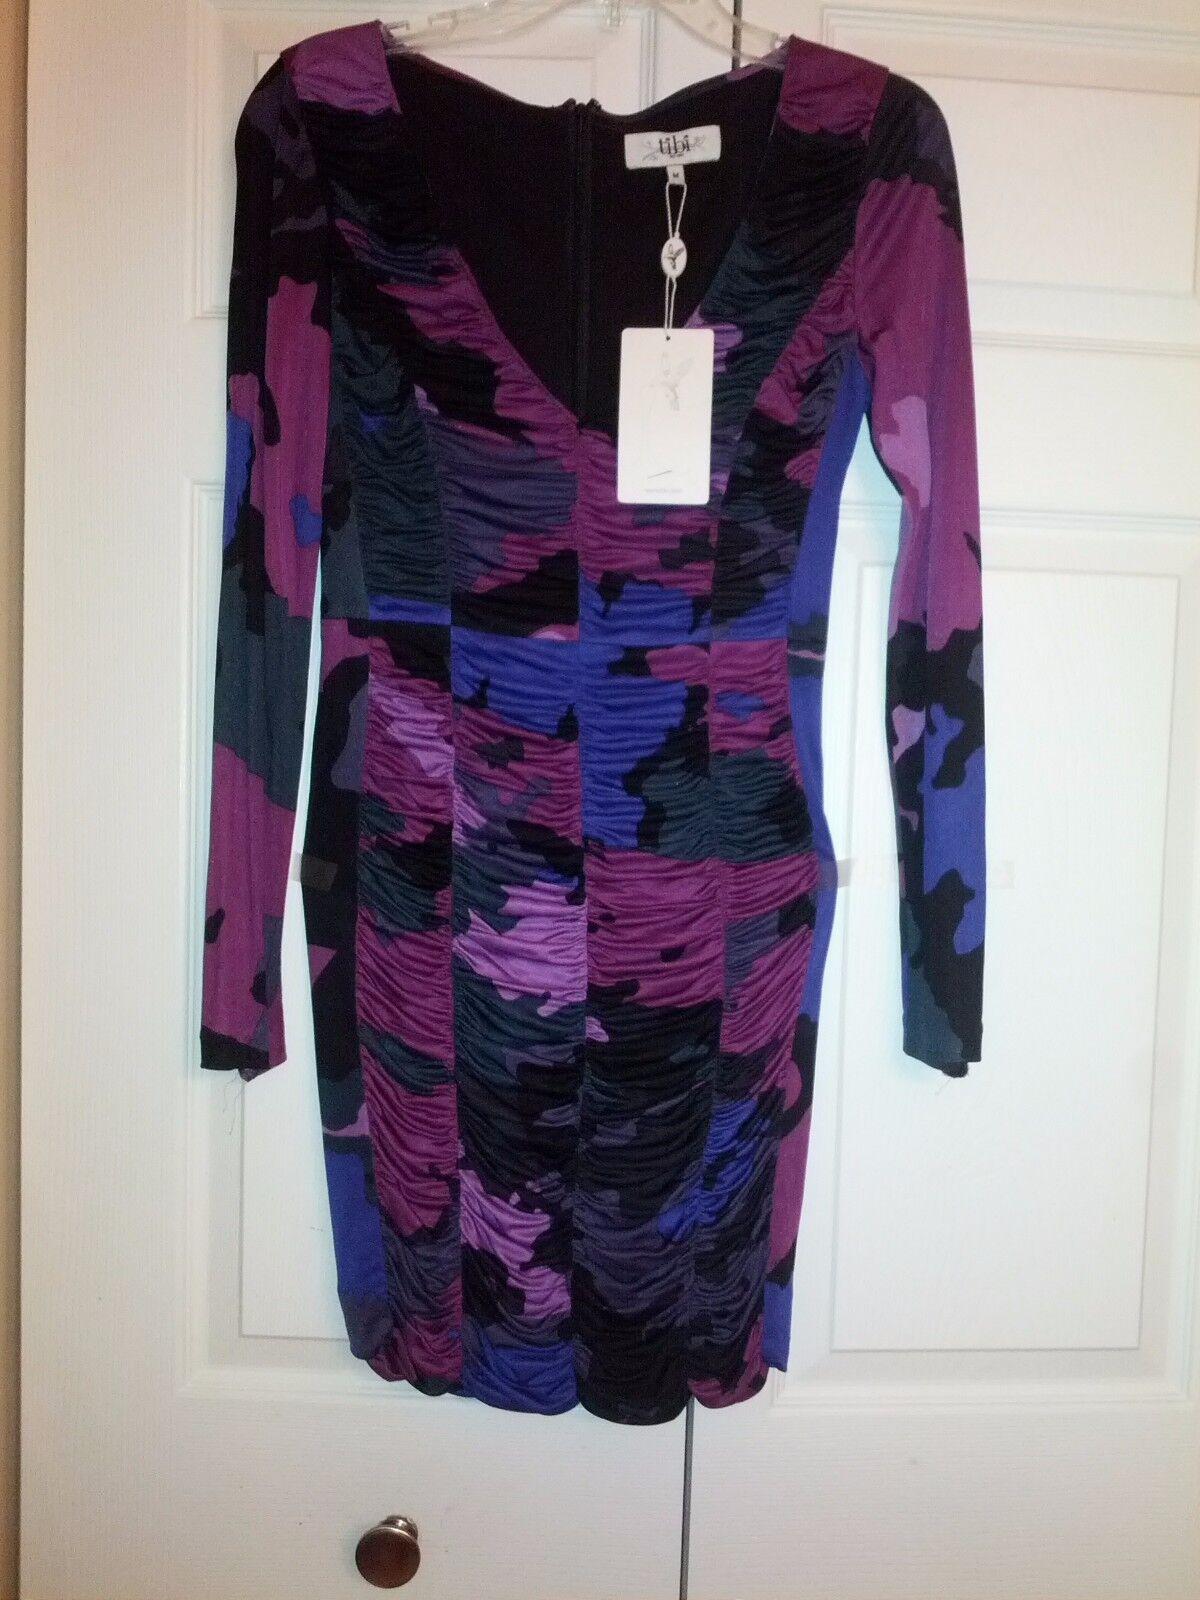 NWT Tibi draped multicolor dress dress dress Size M bb89ef